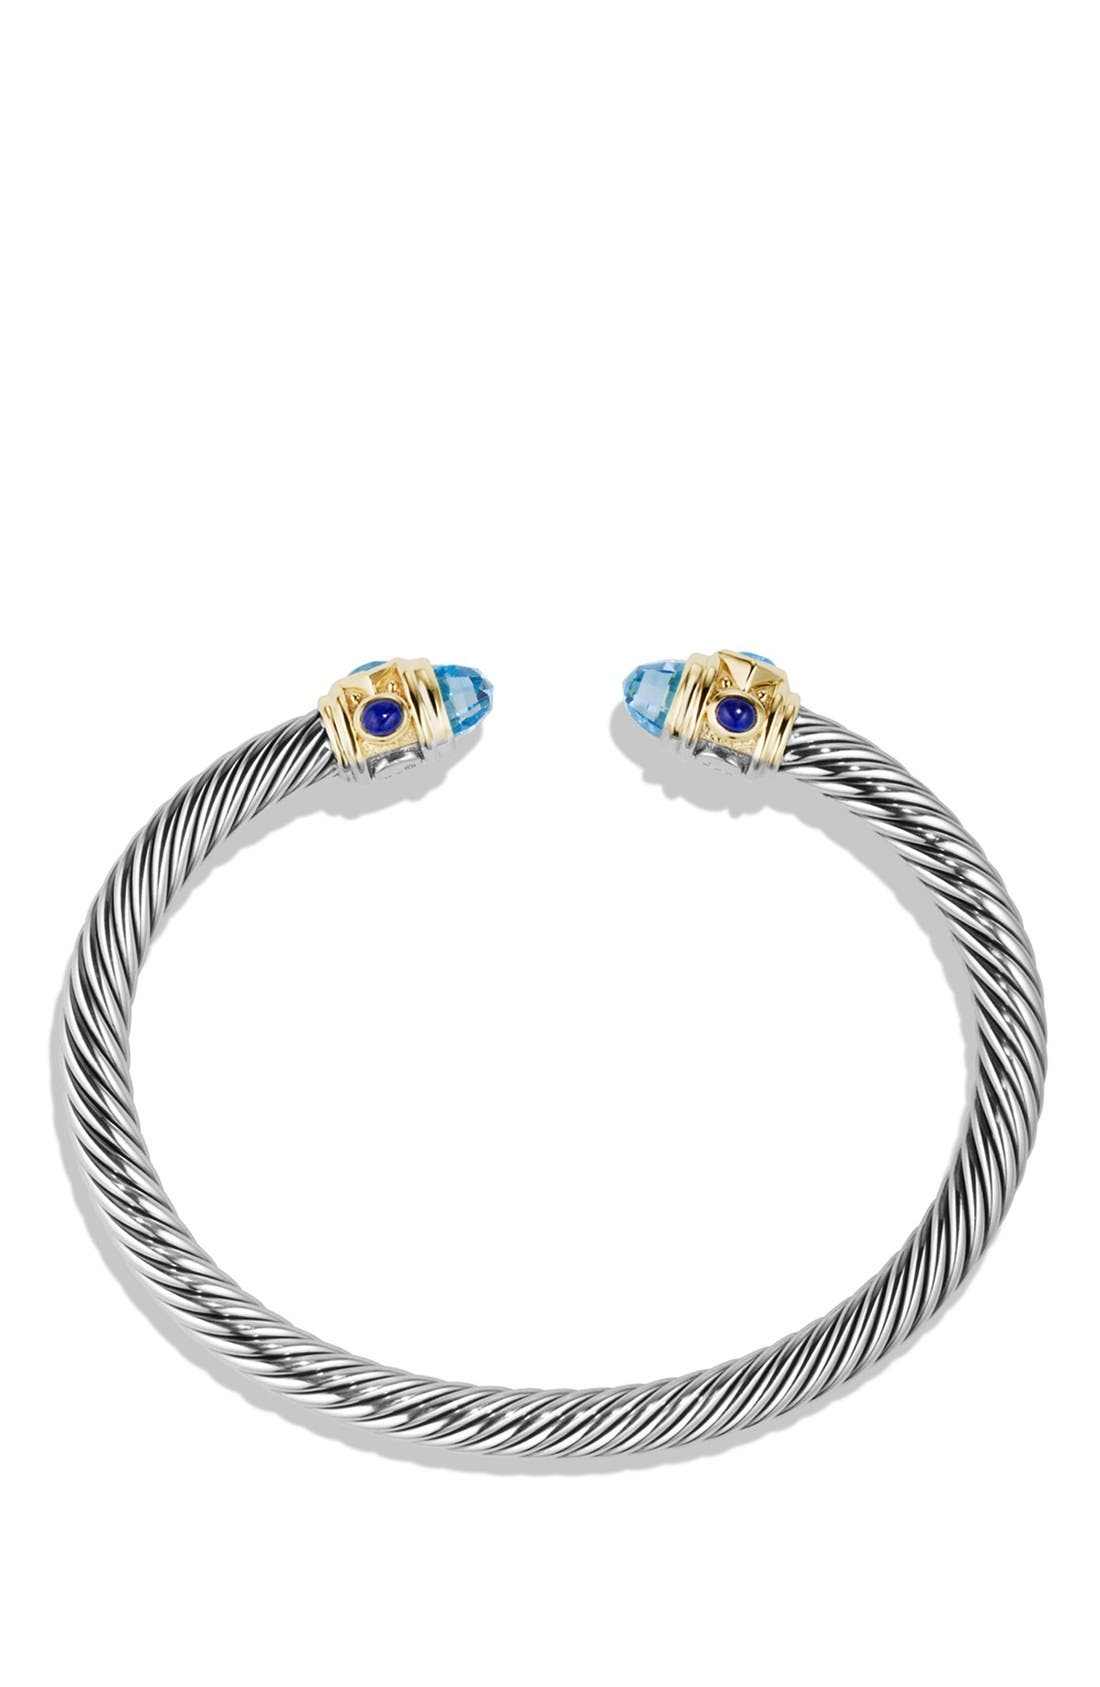 Renaissance Bracelet with Semiprecious Stone & 14k Gold, 5mm,                             Alternate thumbnail 2, color,                             BLUE TOPAZ